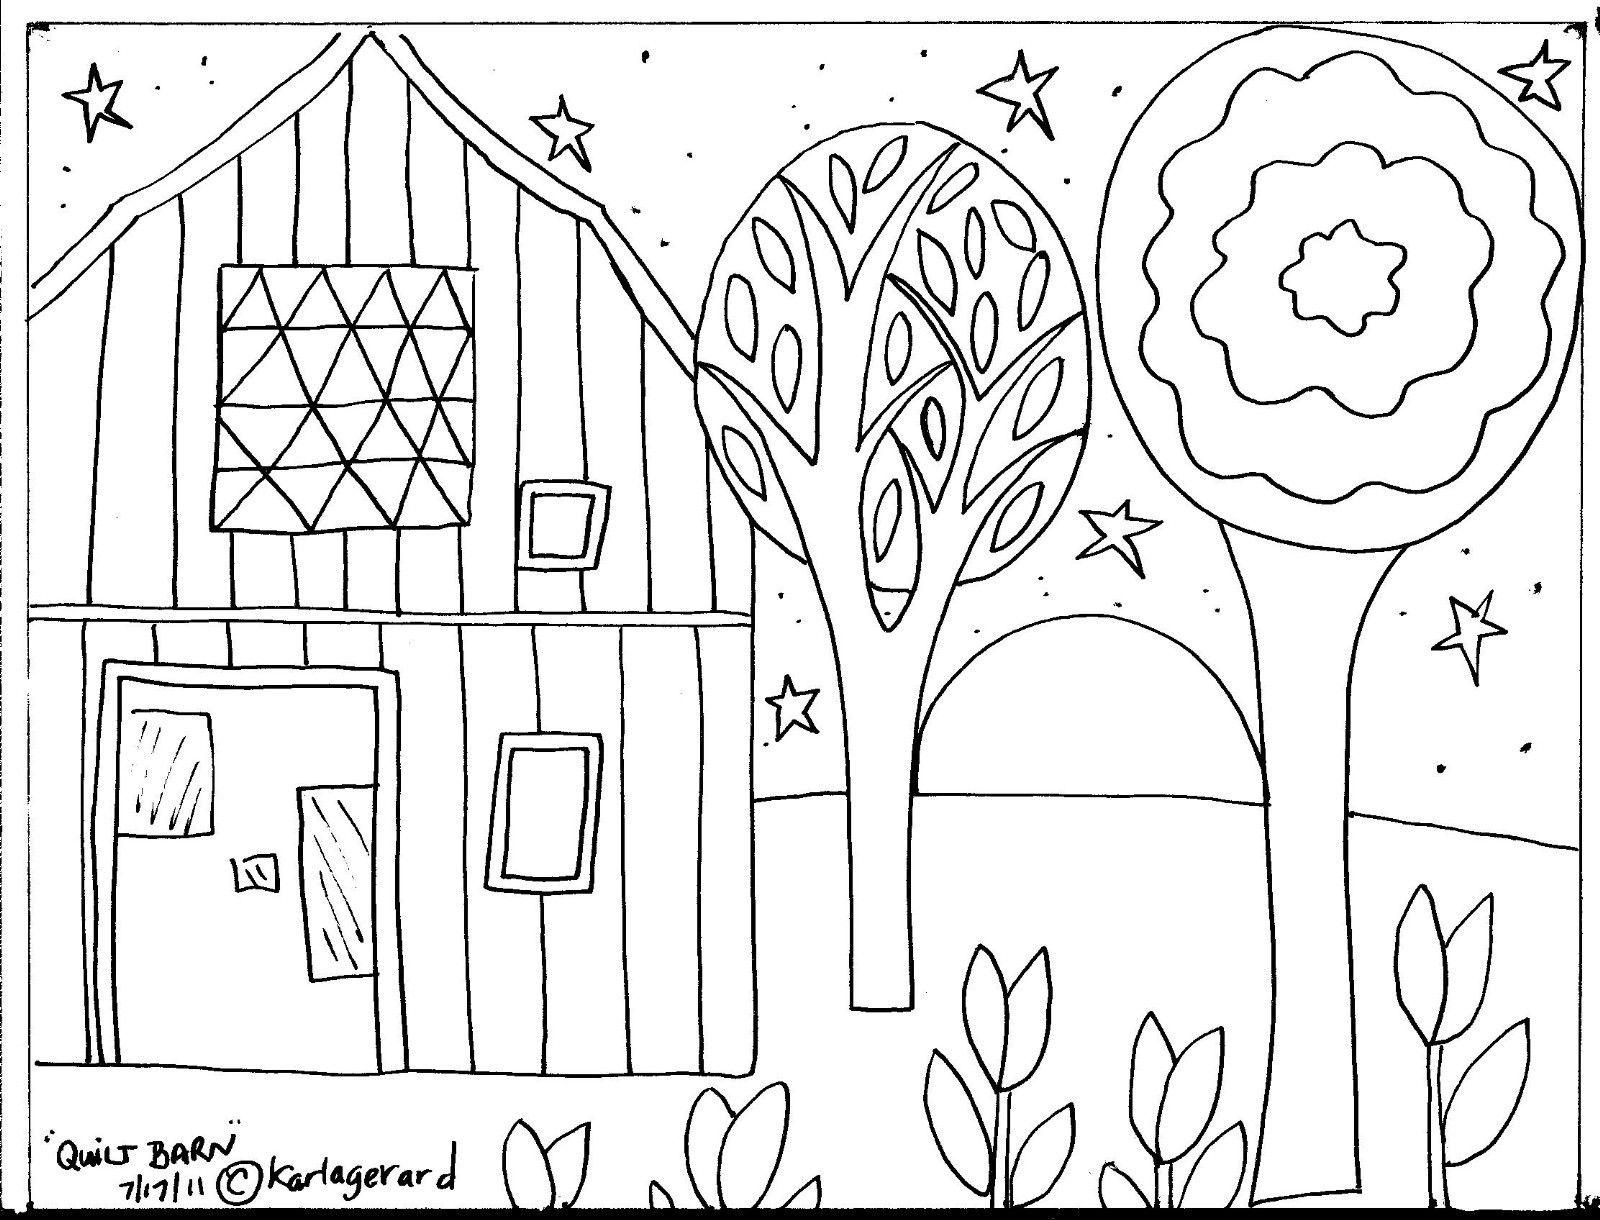 Rug Hook Paper Pattern QUILT BARN Folk Art ABSTRACT MODERN UNIQUE Karla G | eBay